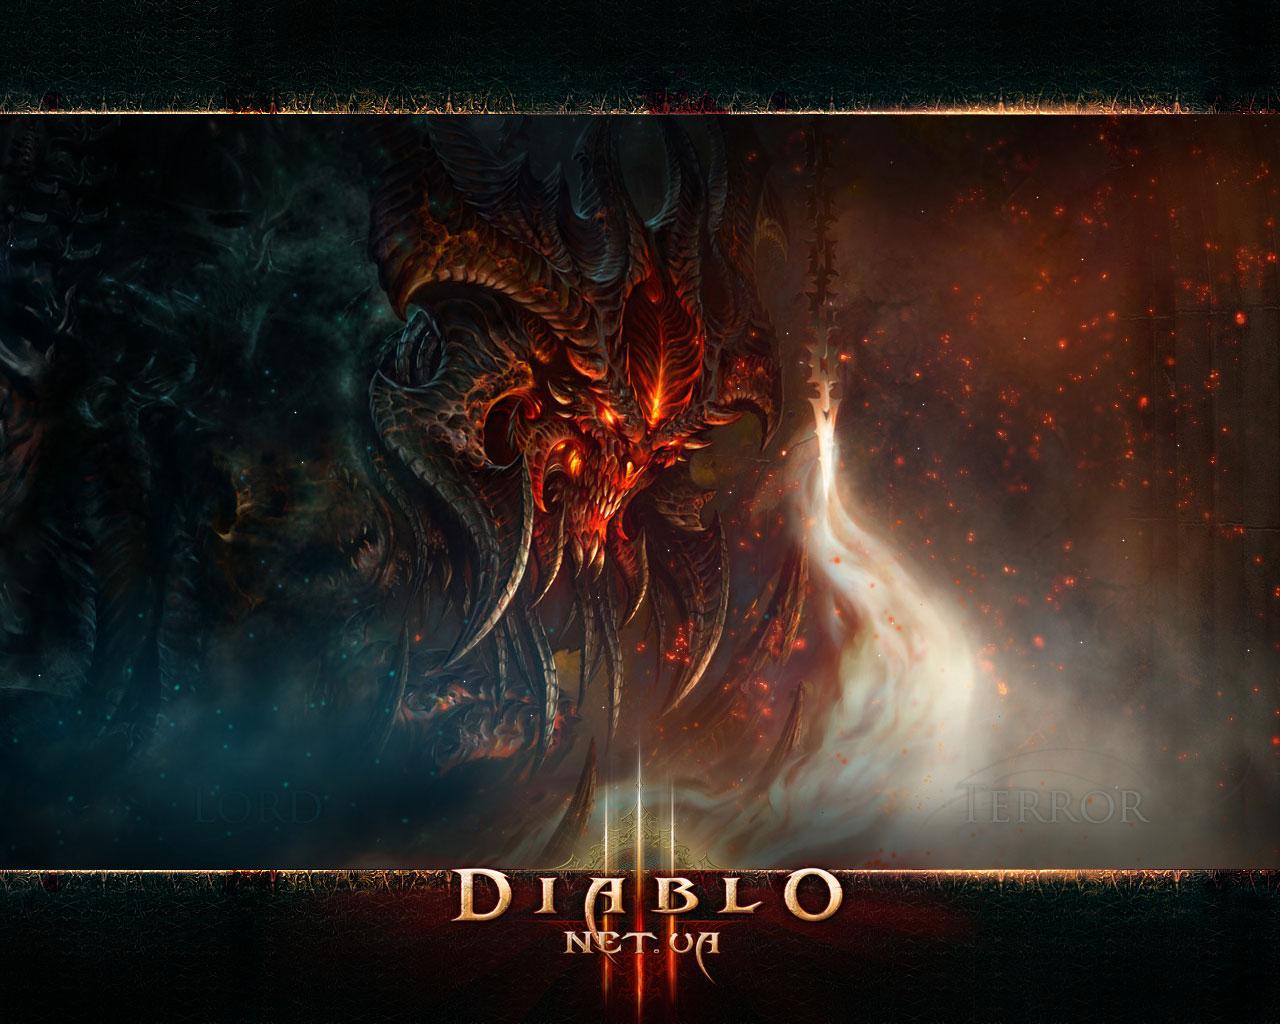 DIABLO 3 PICTURES DOWNLOAD ~ HD WALLPAPERS